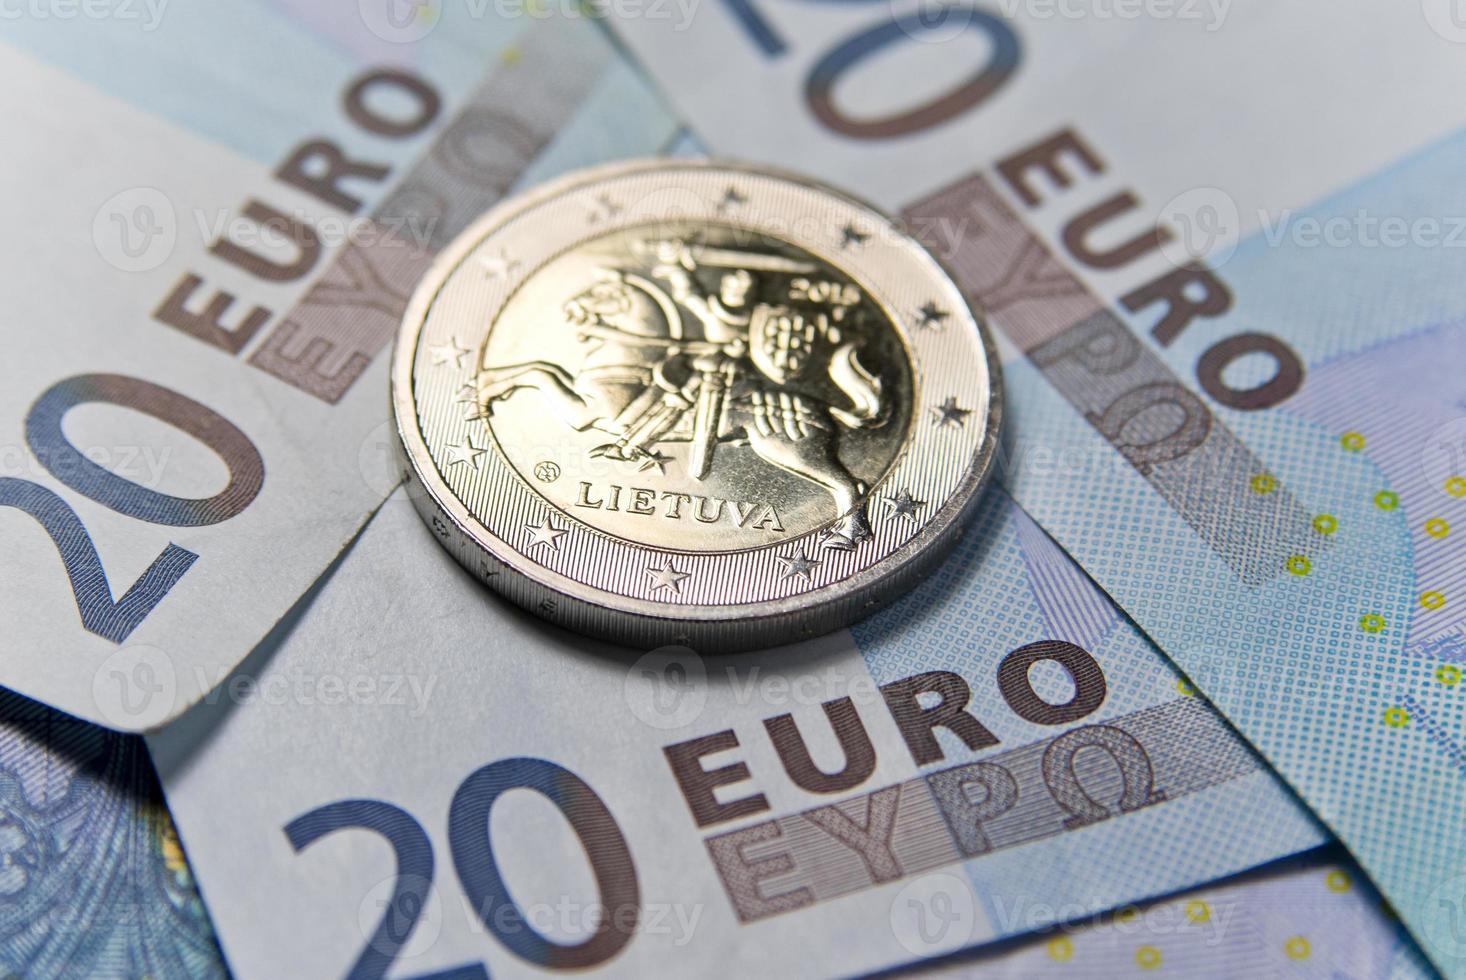 nouvel euro lituanien photo